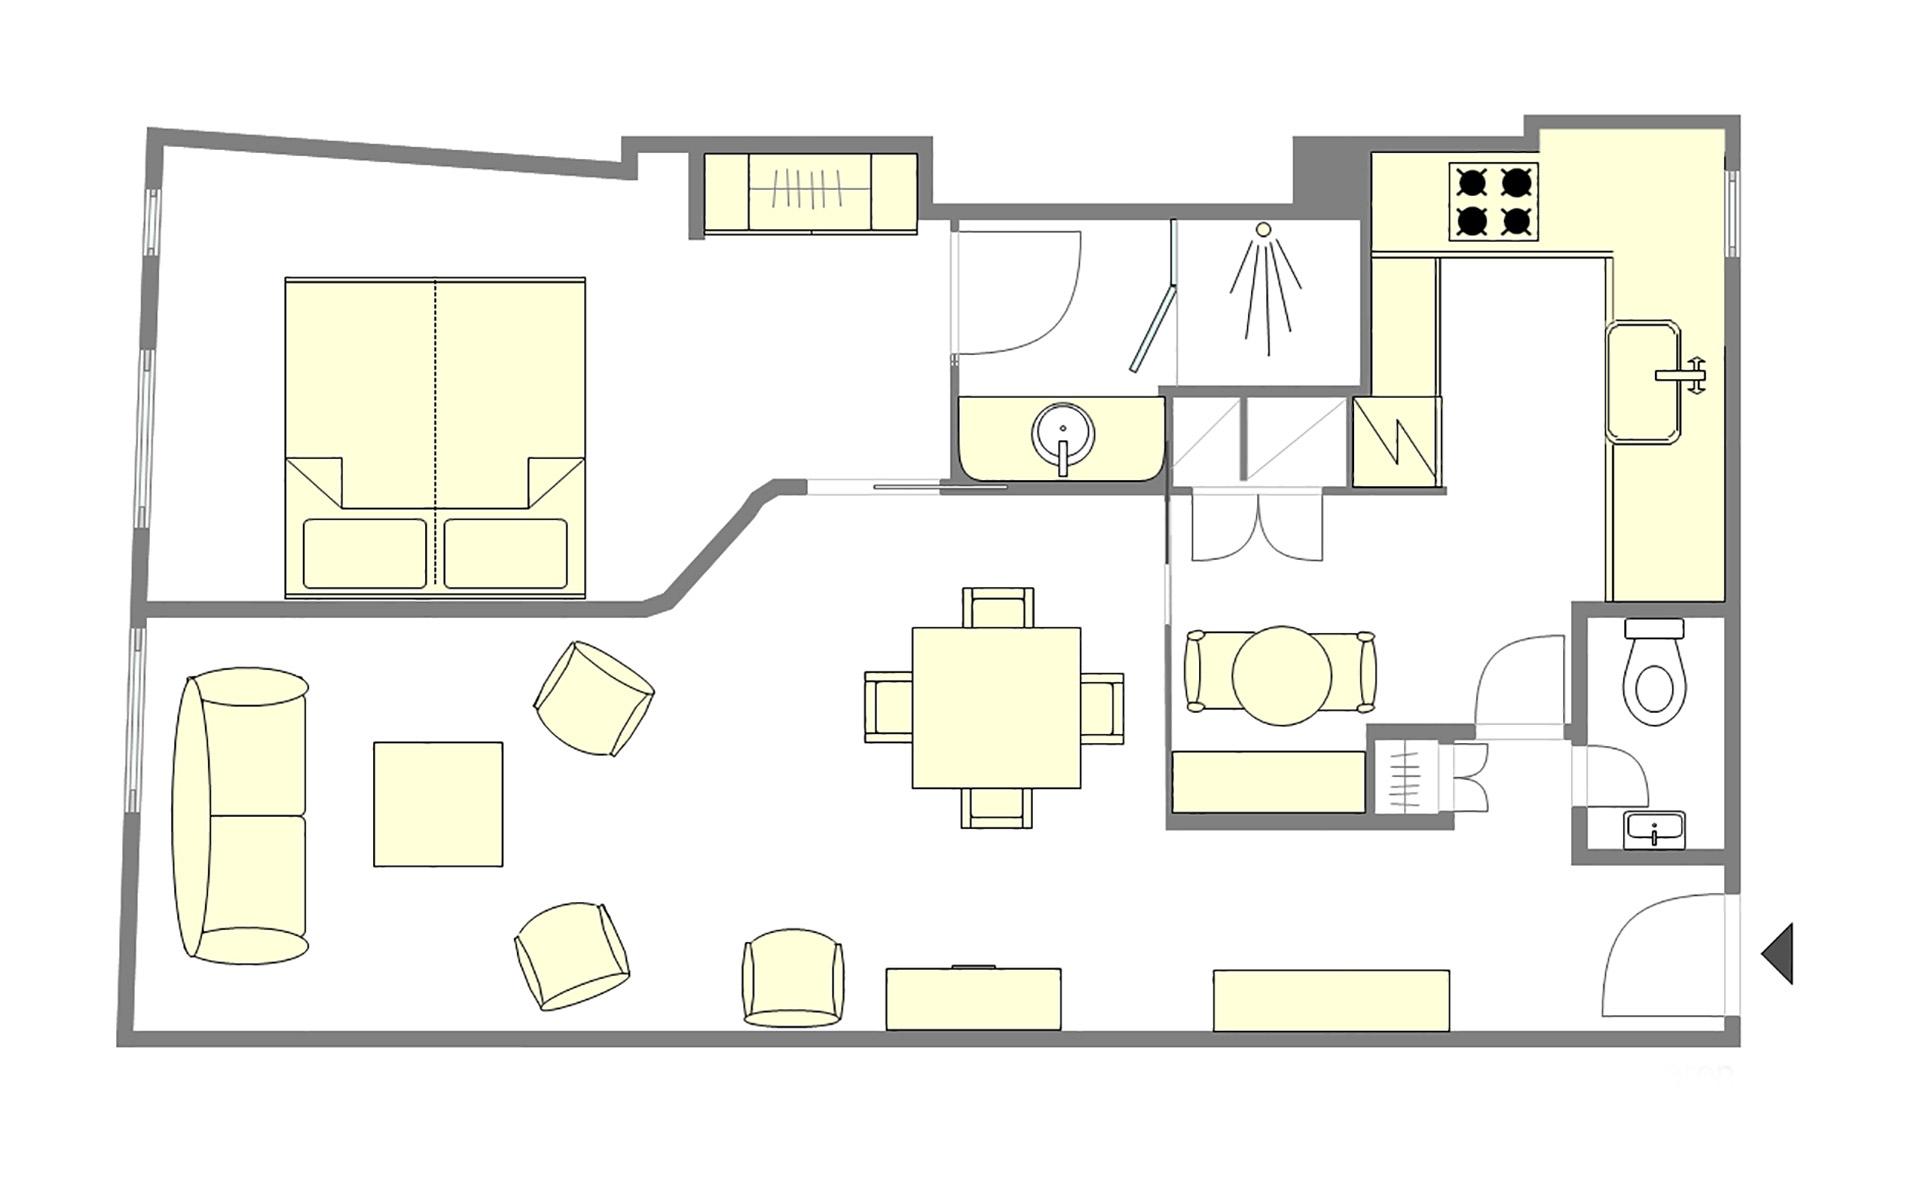 Lussac Floorplan